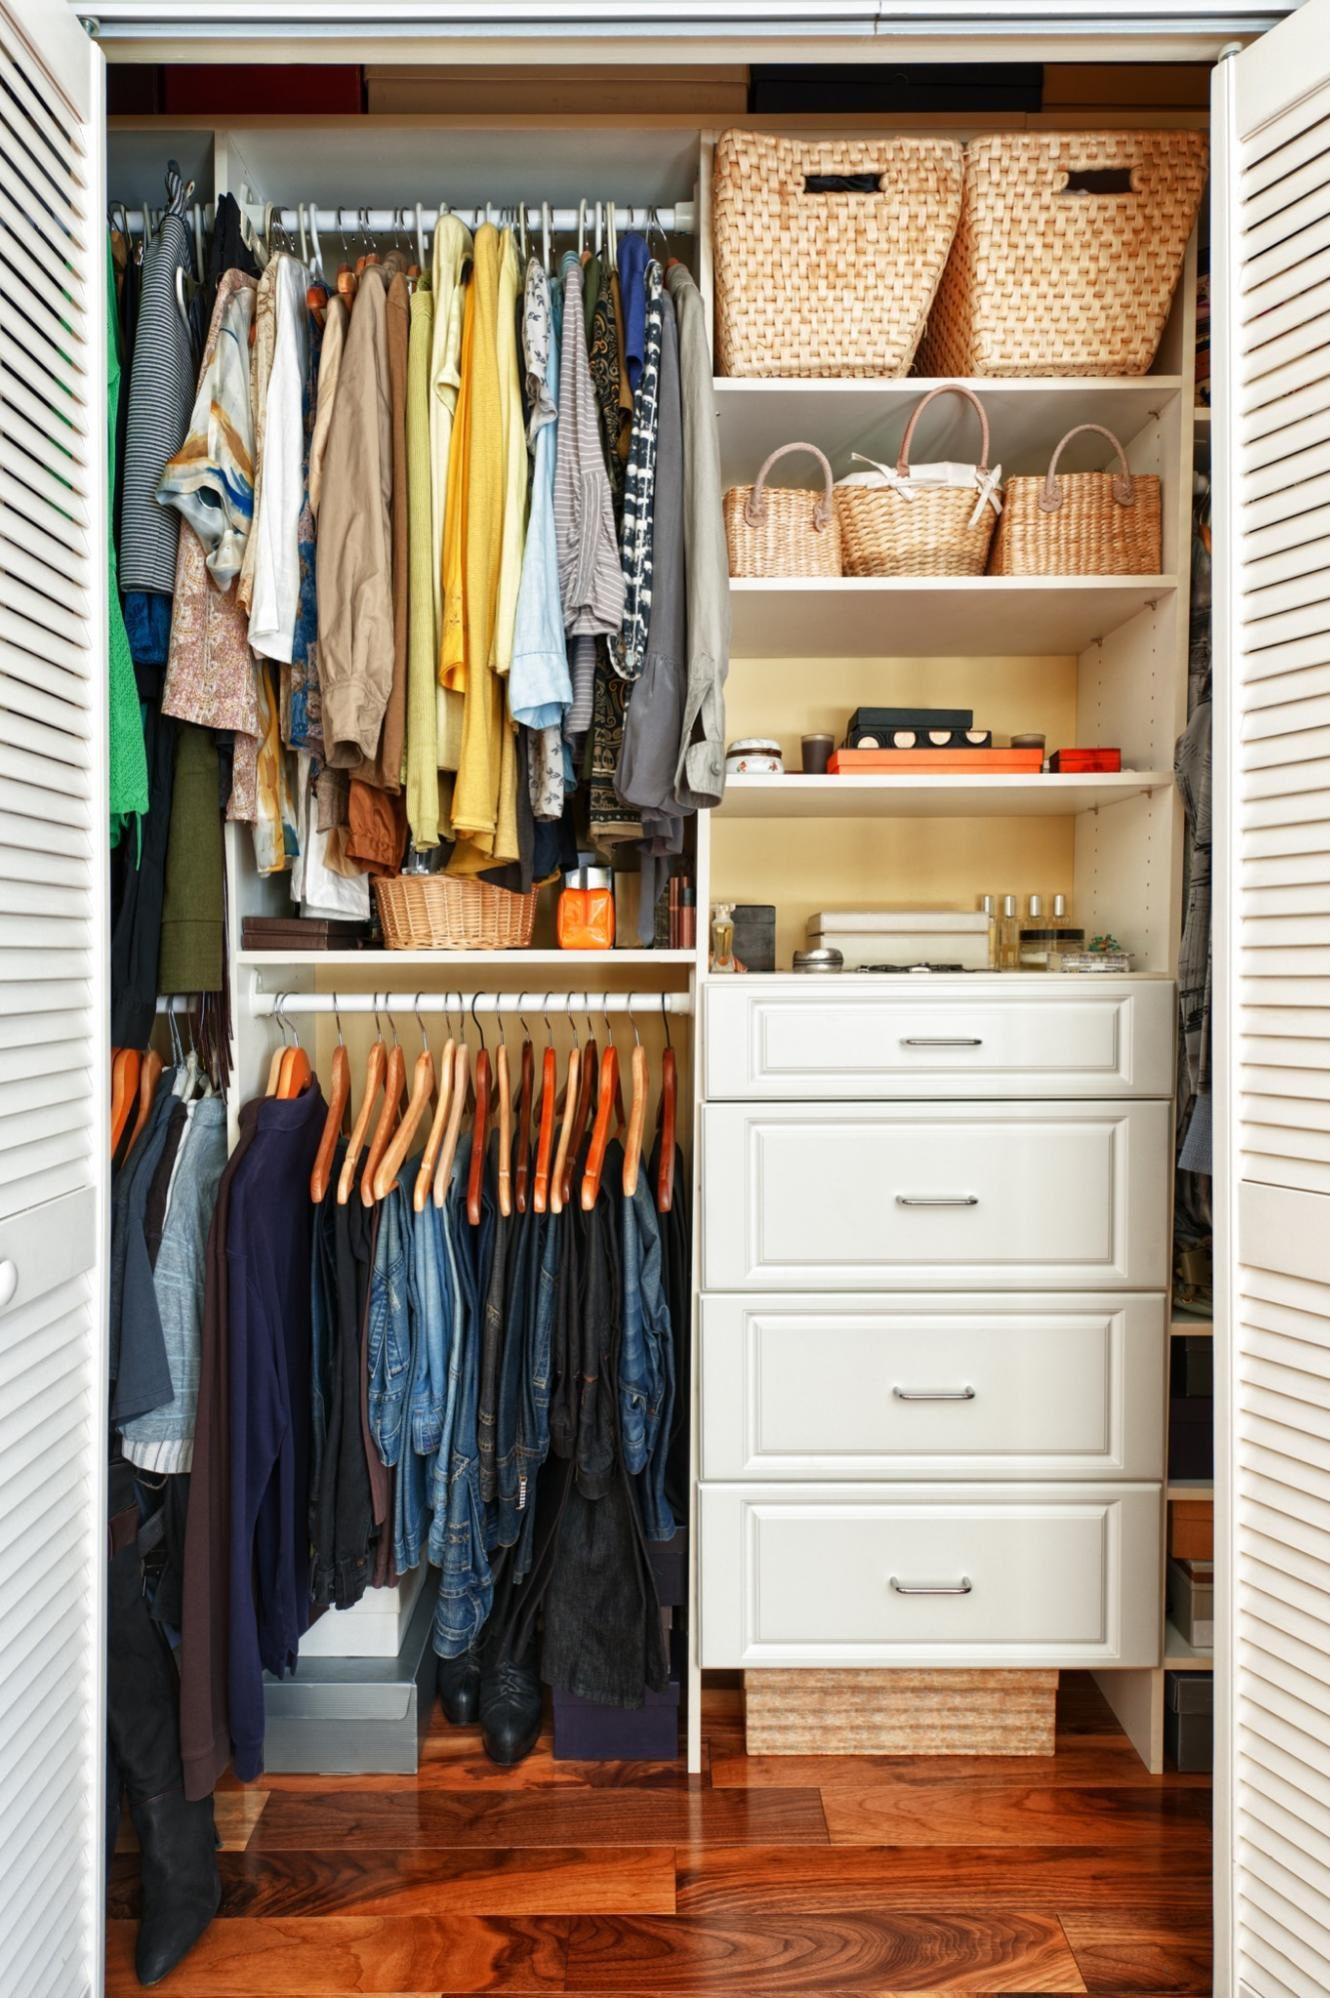 bookshelf ideas: Organized closet